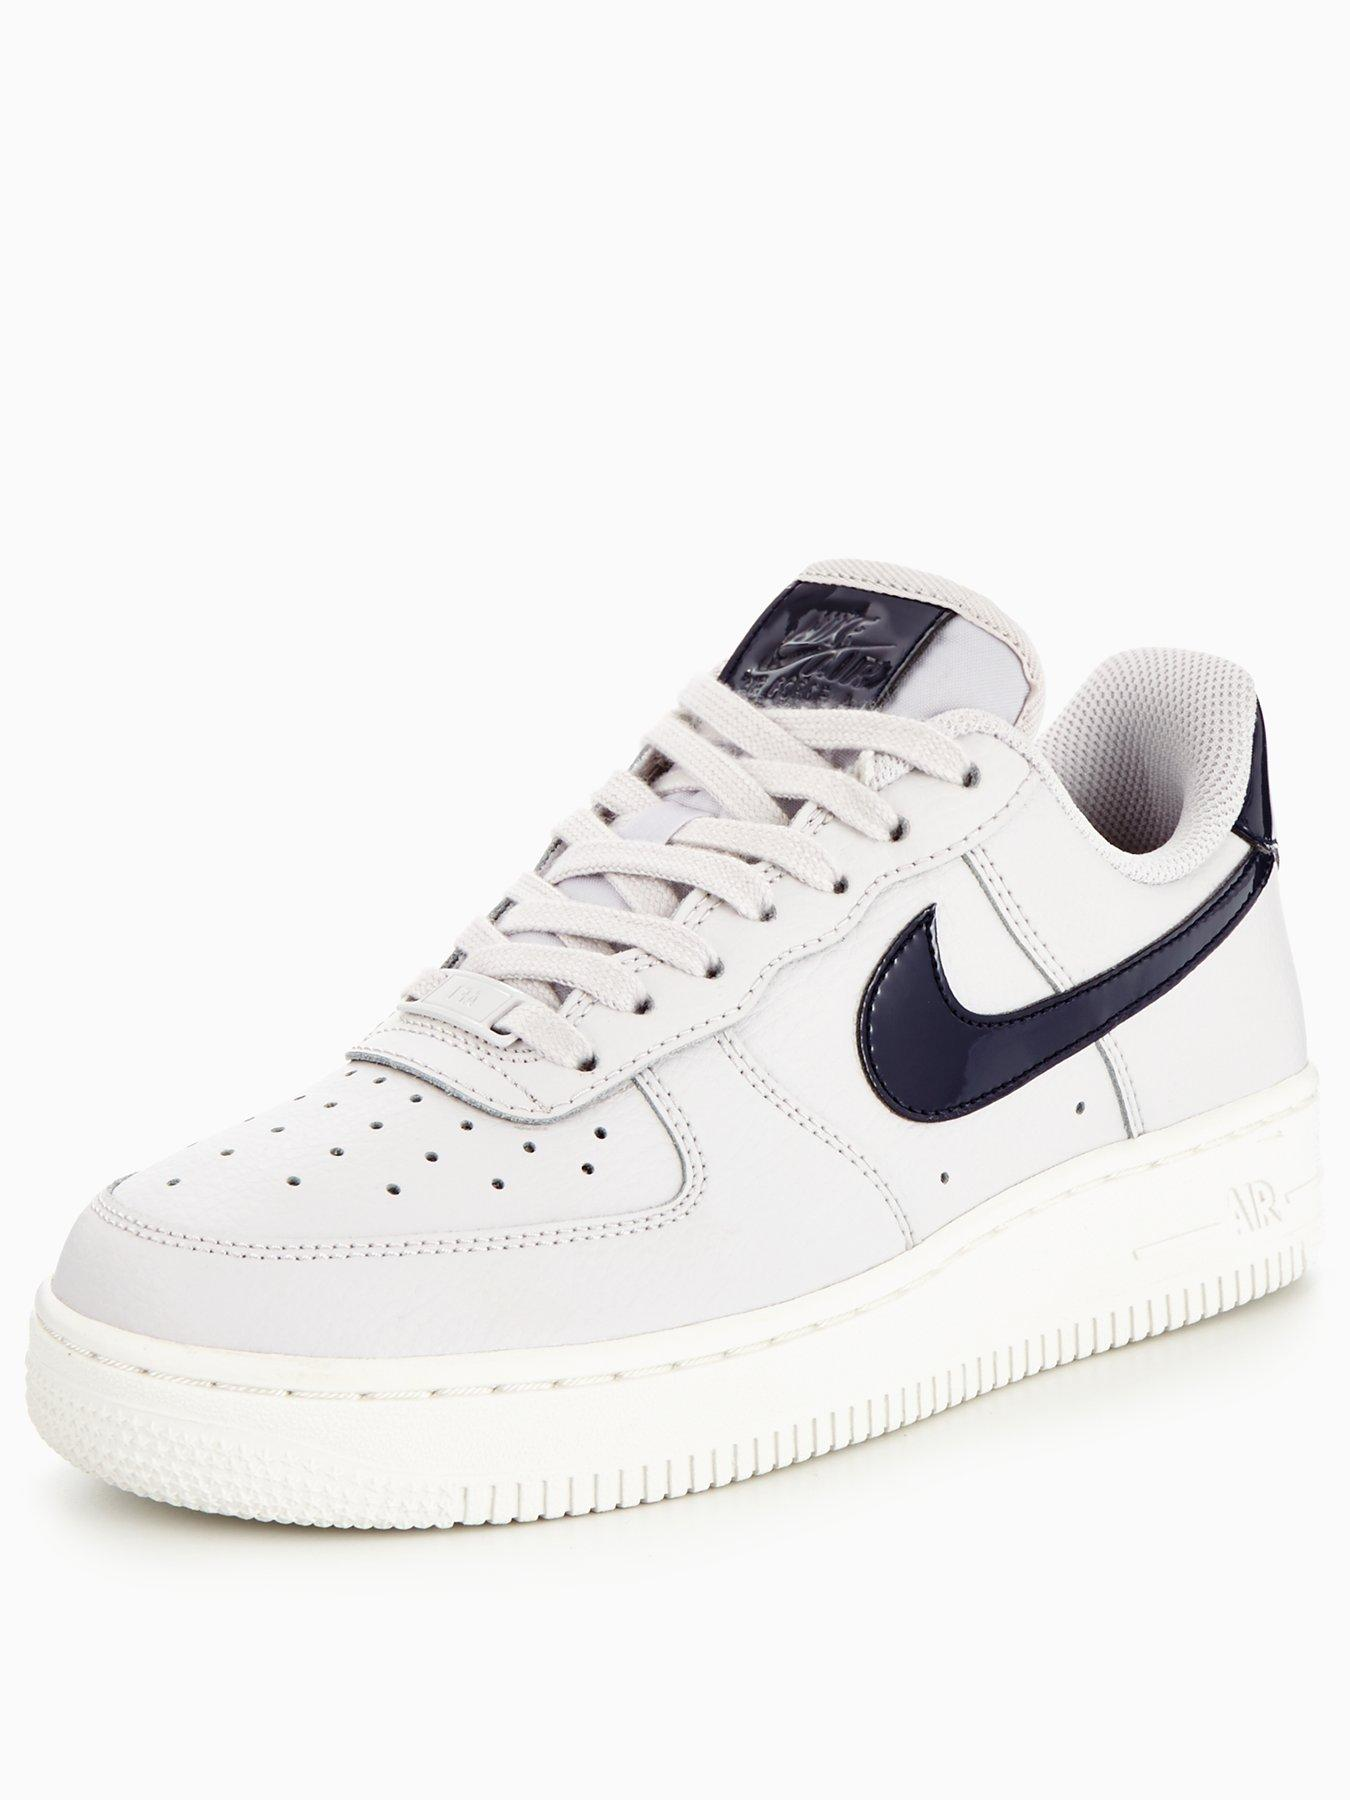 promo code db035 28603 Nike Air Force 1 07 Se Lx Hidromasaje comprar barato extremadamente 4faFTL